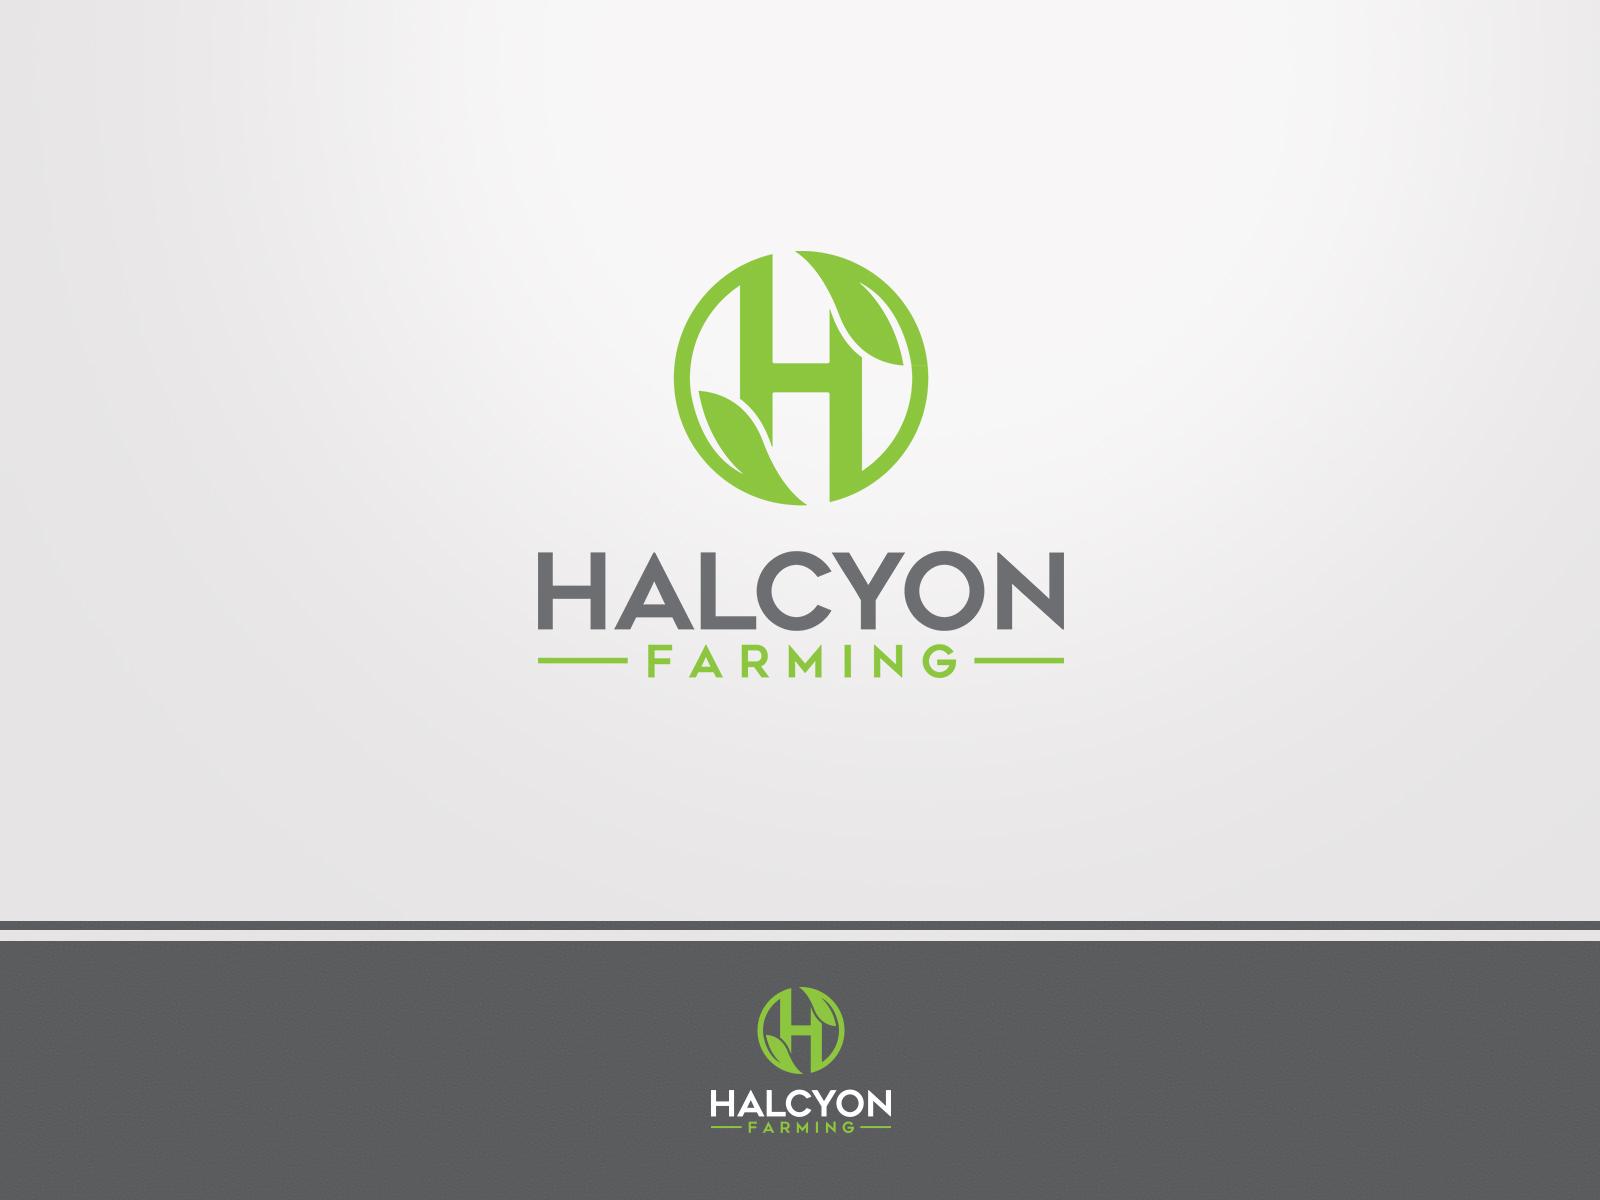 Logo Design by Ahenk Ahenk - Entry No. 62 in the Logo Design Contest Creative Logo Design for Halcyon Farming.